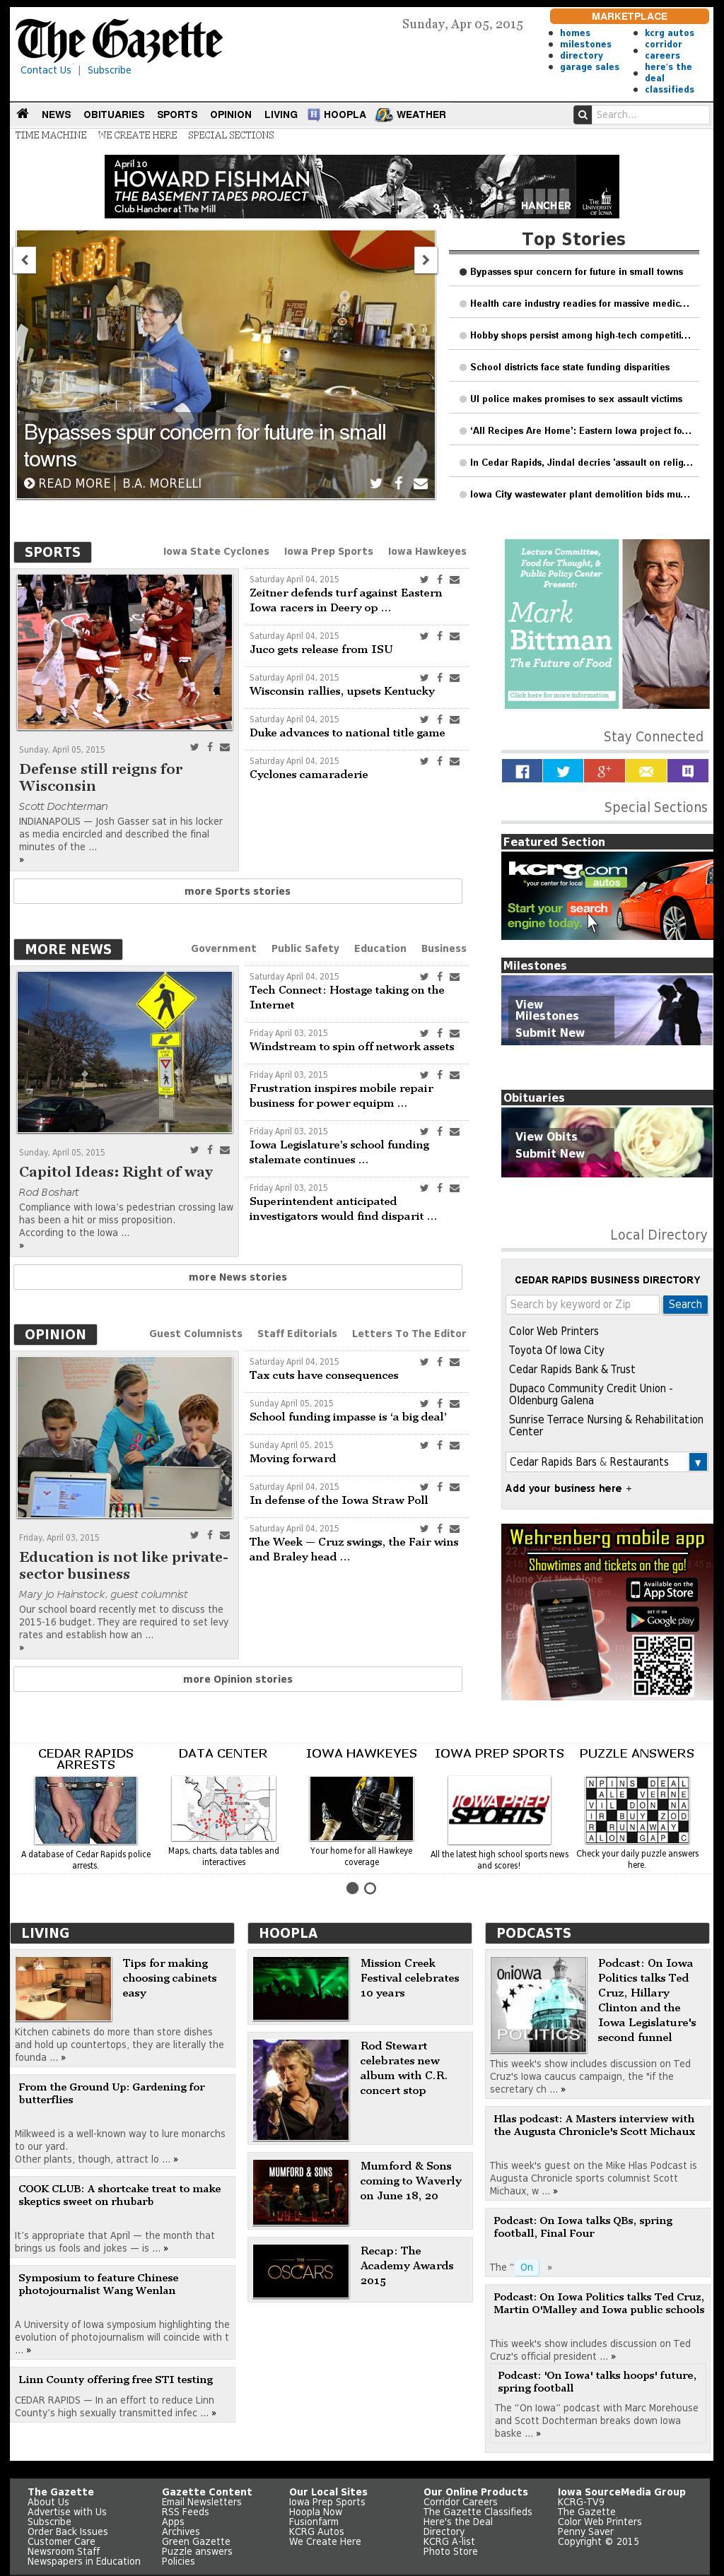 The (Cedar Rapids) Gazette at Sunday April 5, 2015, 12:08 p.m. UTC